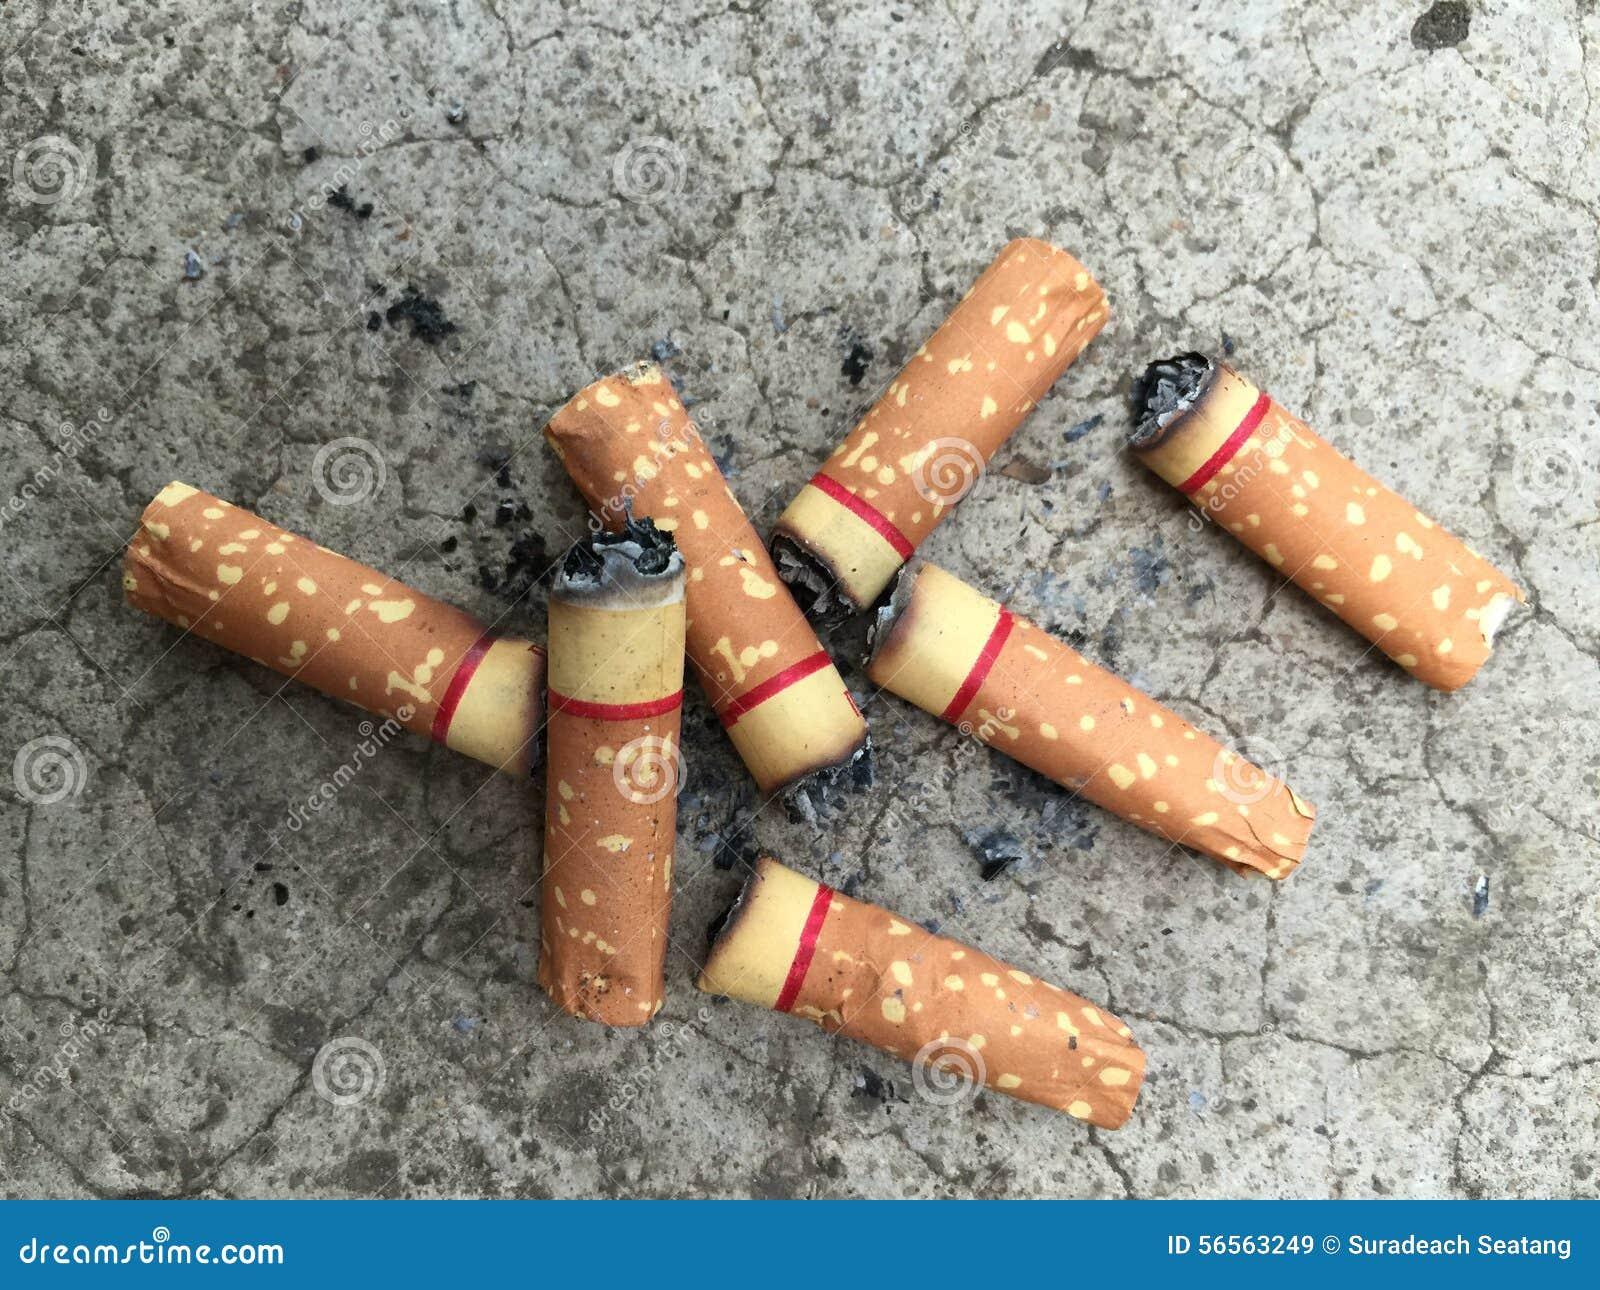 Download Στέλεχος τσιγάρων στο πάτωμα Στοκ Εικόνα - εικόνα από εθισμένοι, μμένος: 56563249